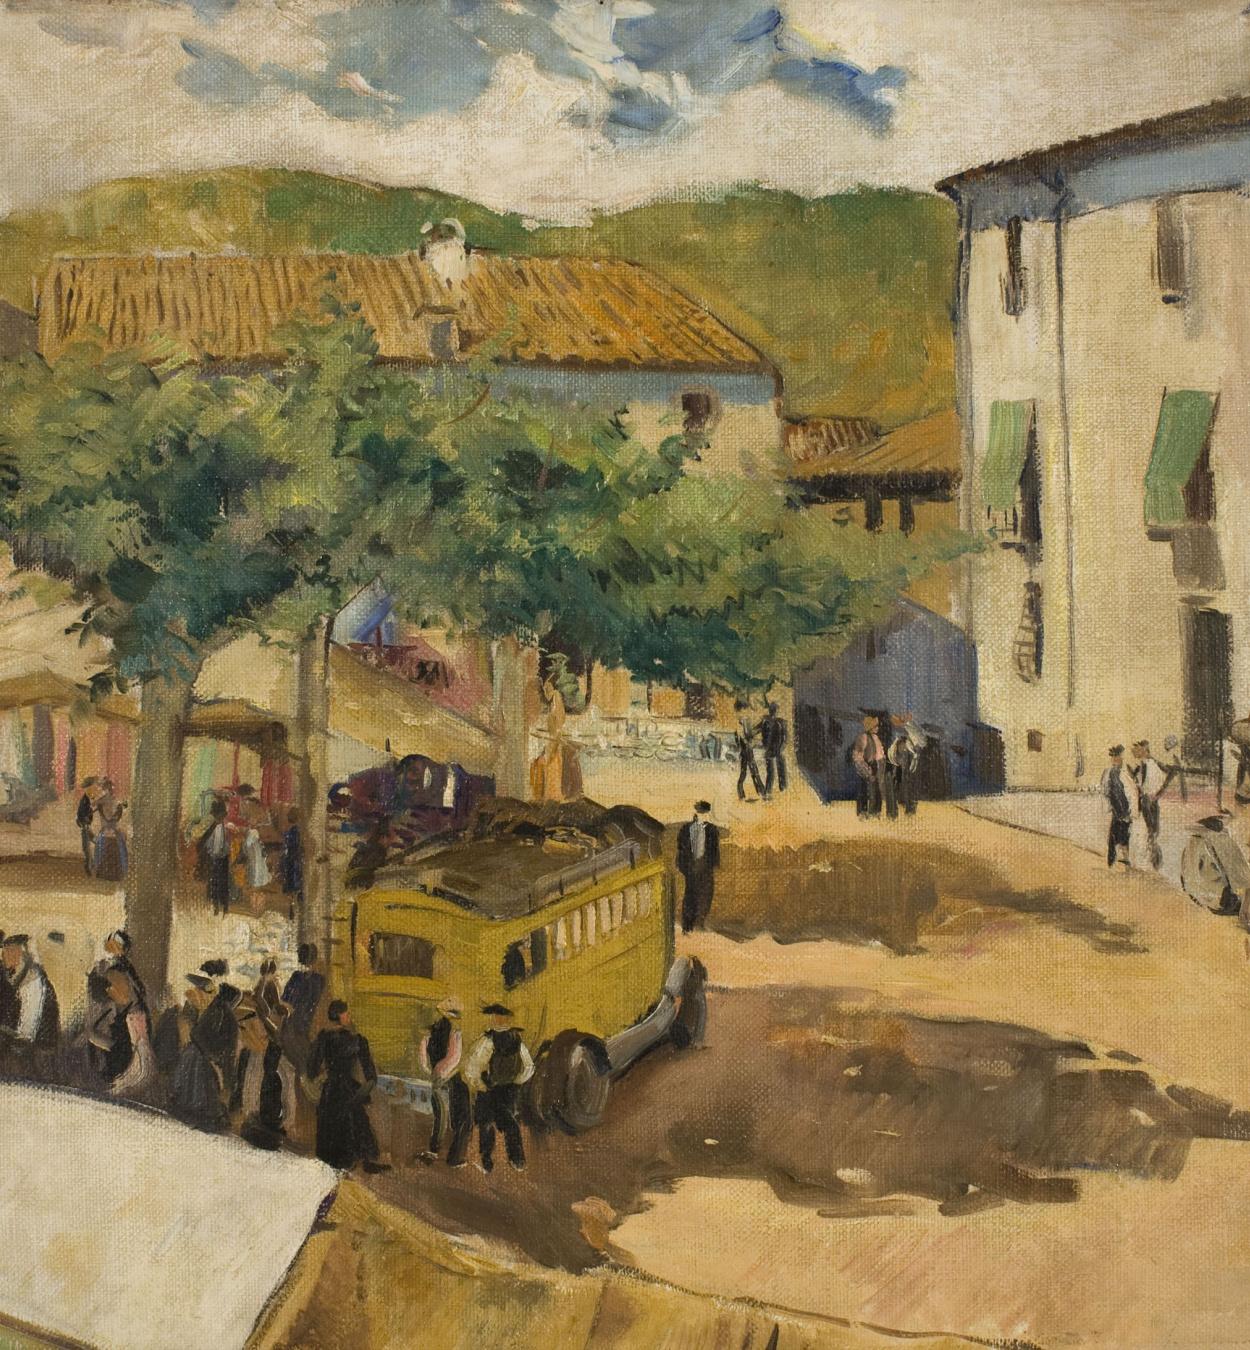 Oleguer Junyent - Santa Coloma. The Market - 1933